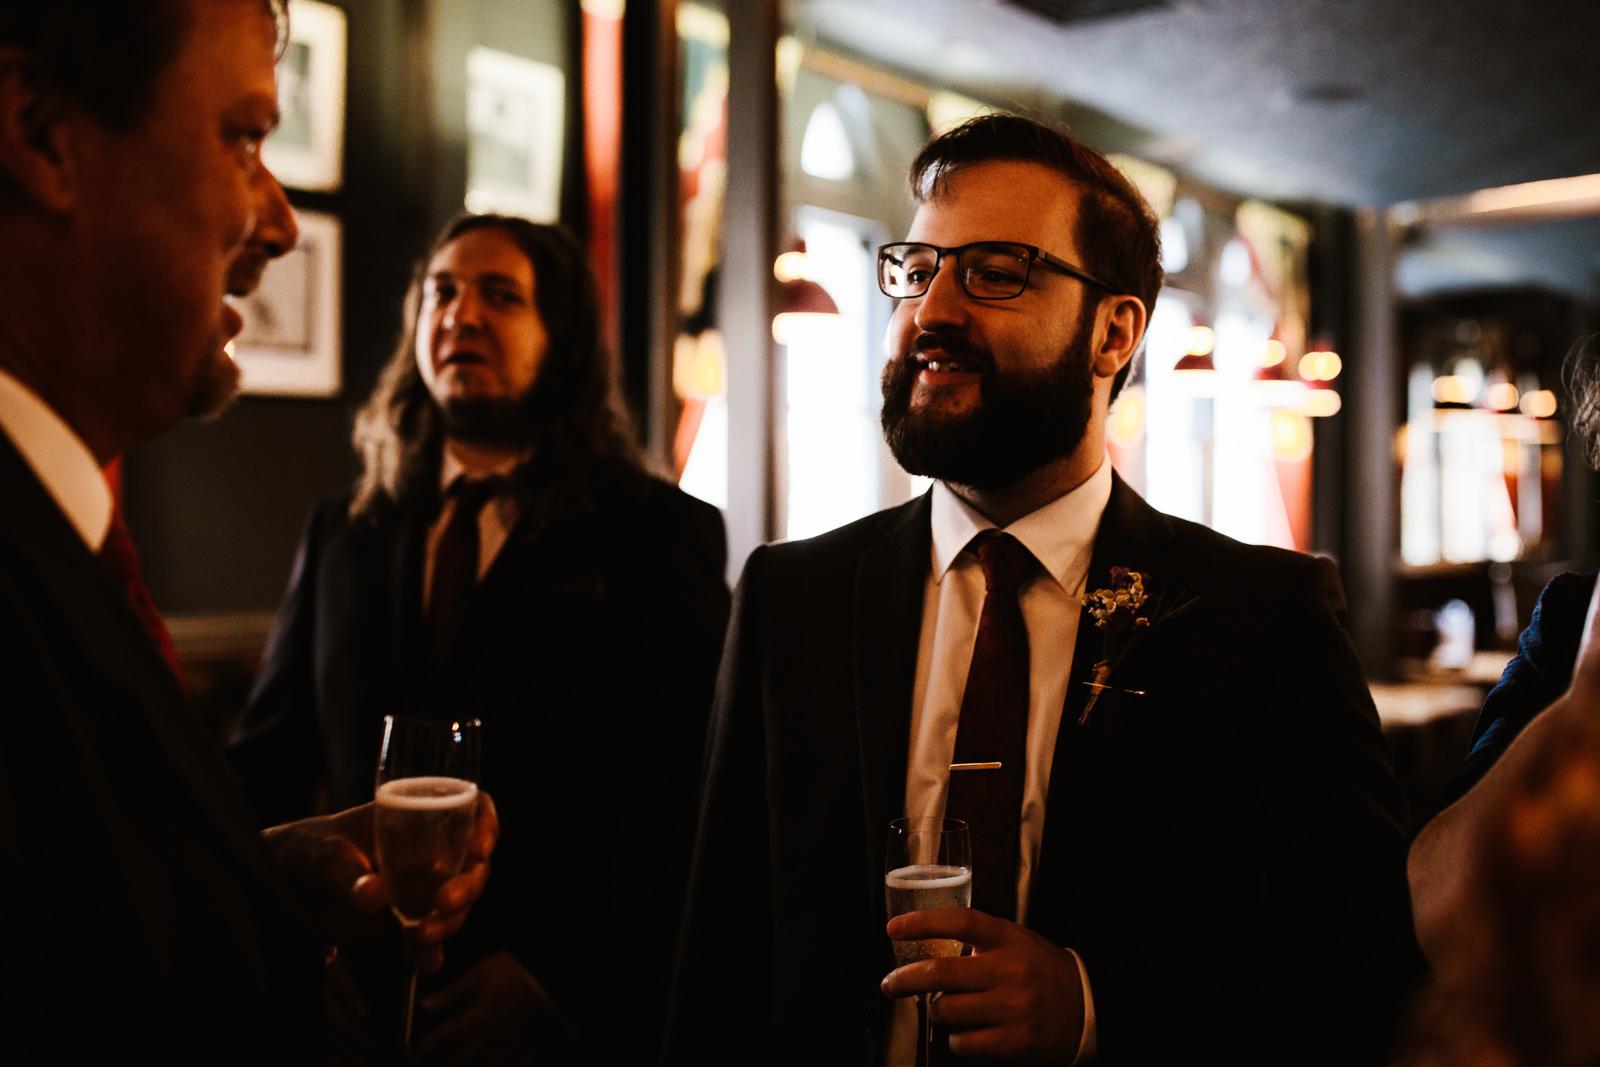 Wedding guest drinking beer